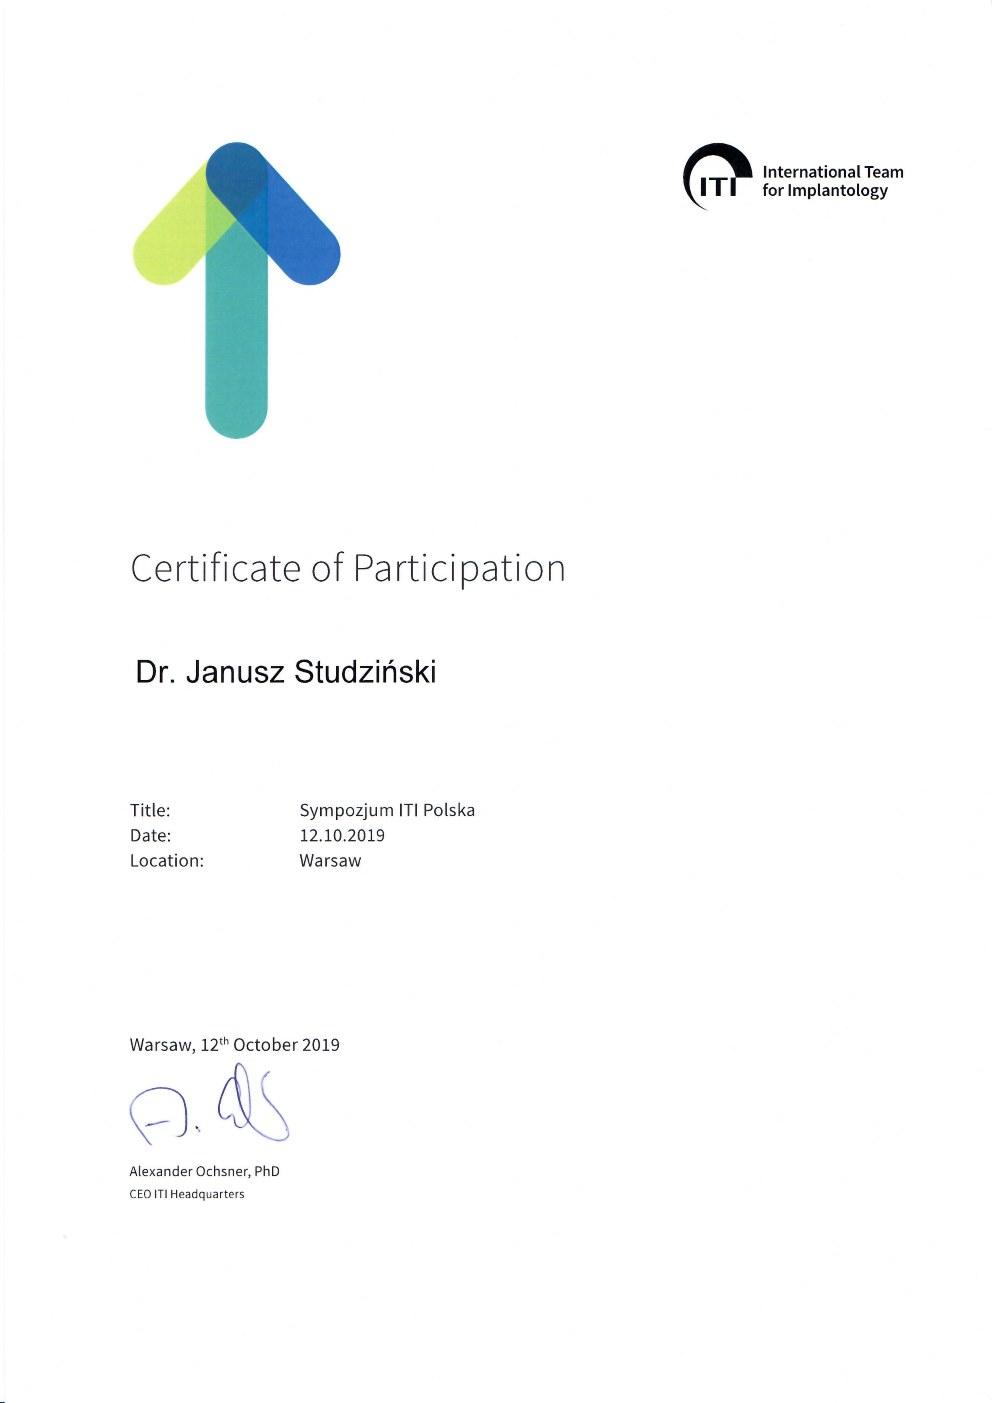 certyfikat iti (1)